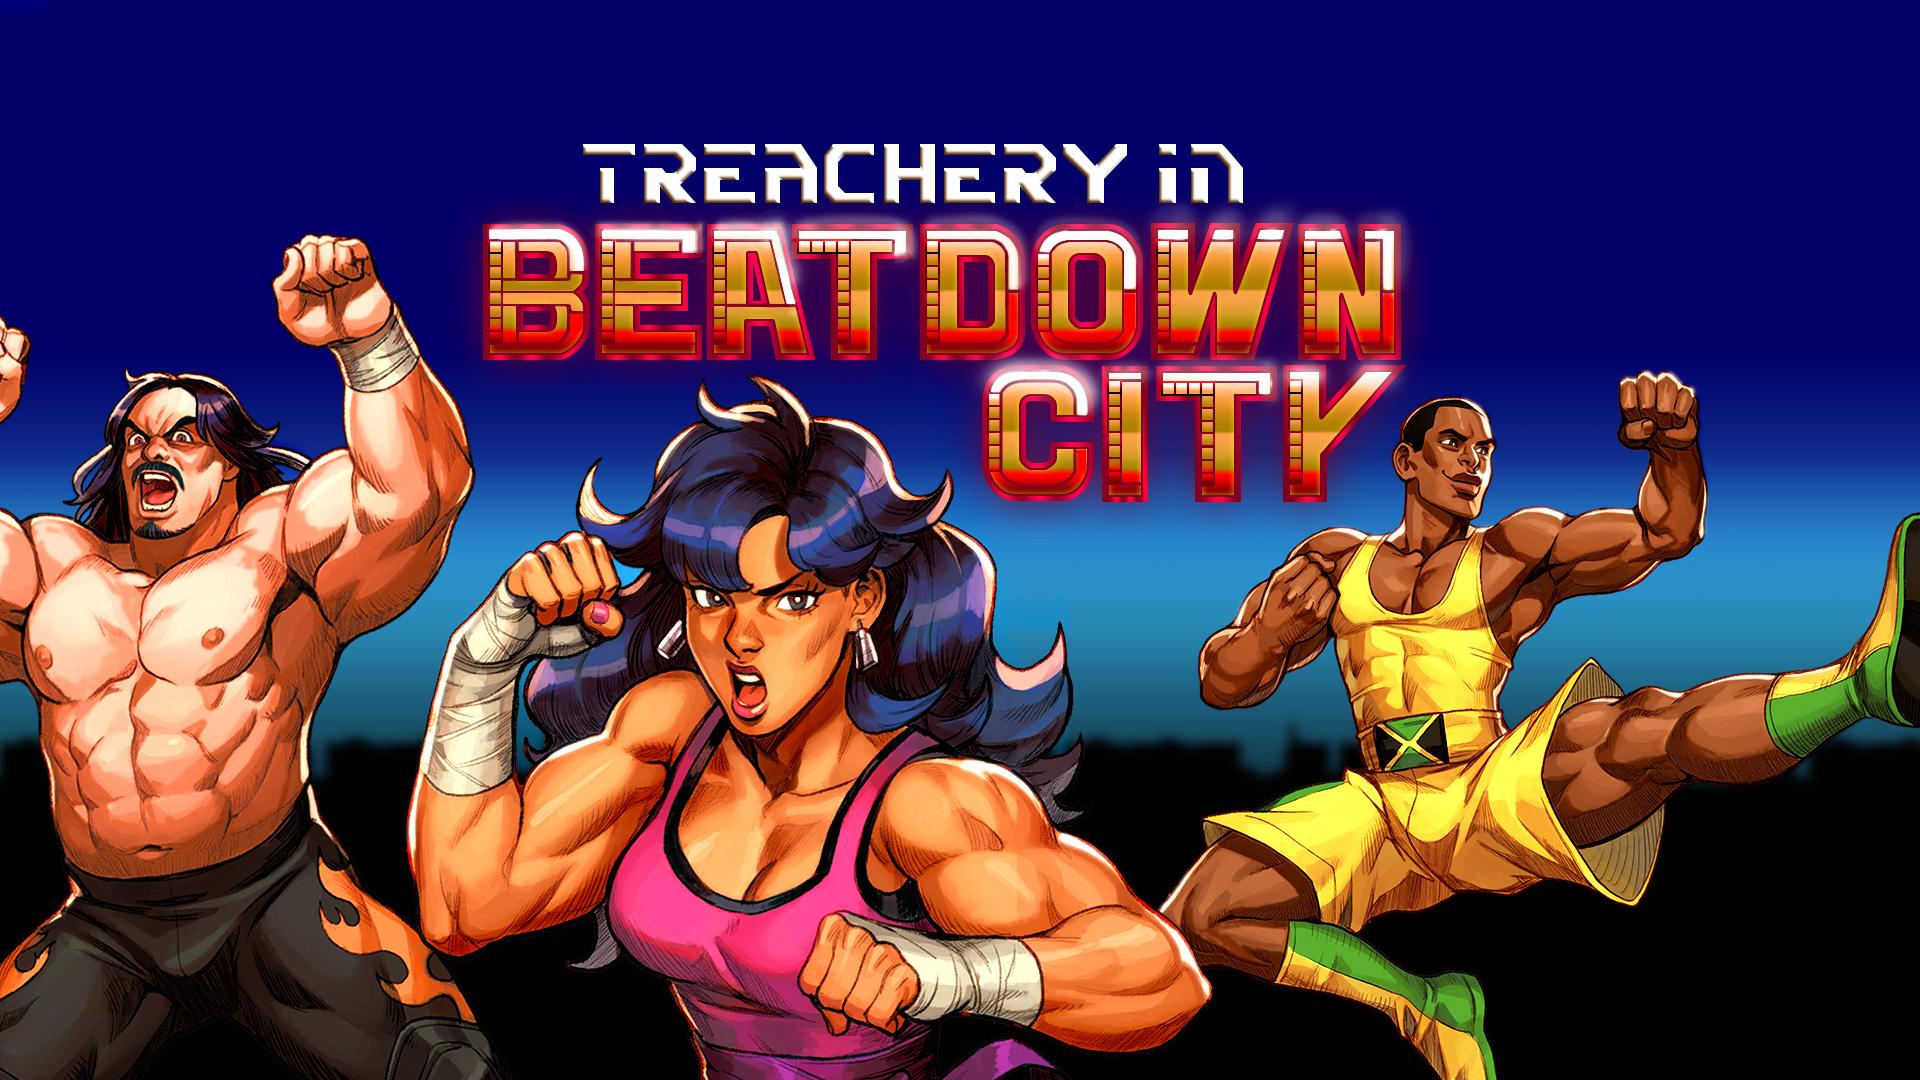 Review: Treachery in Beatdown City